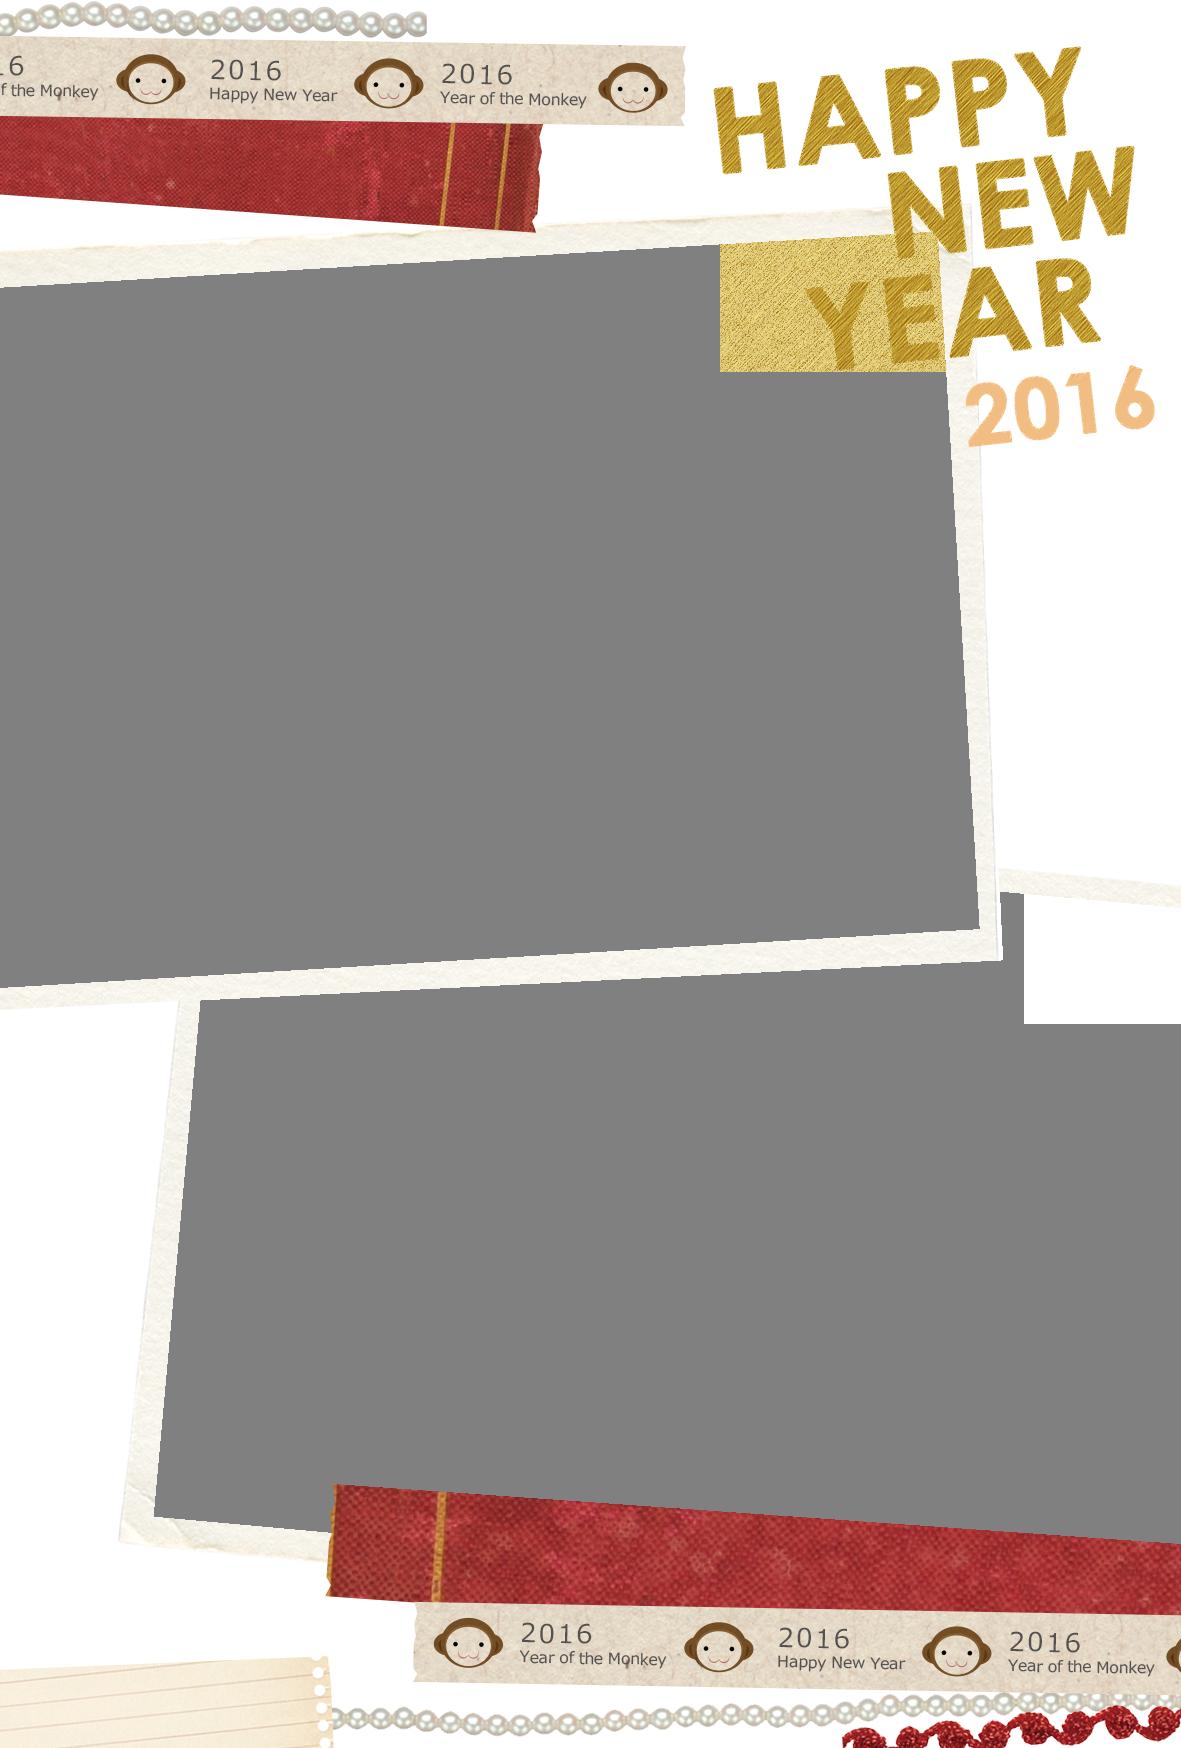 20151210132711